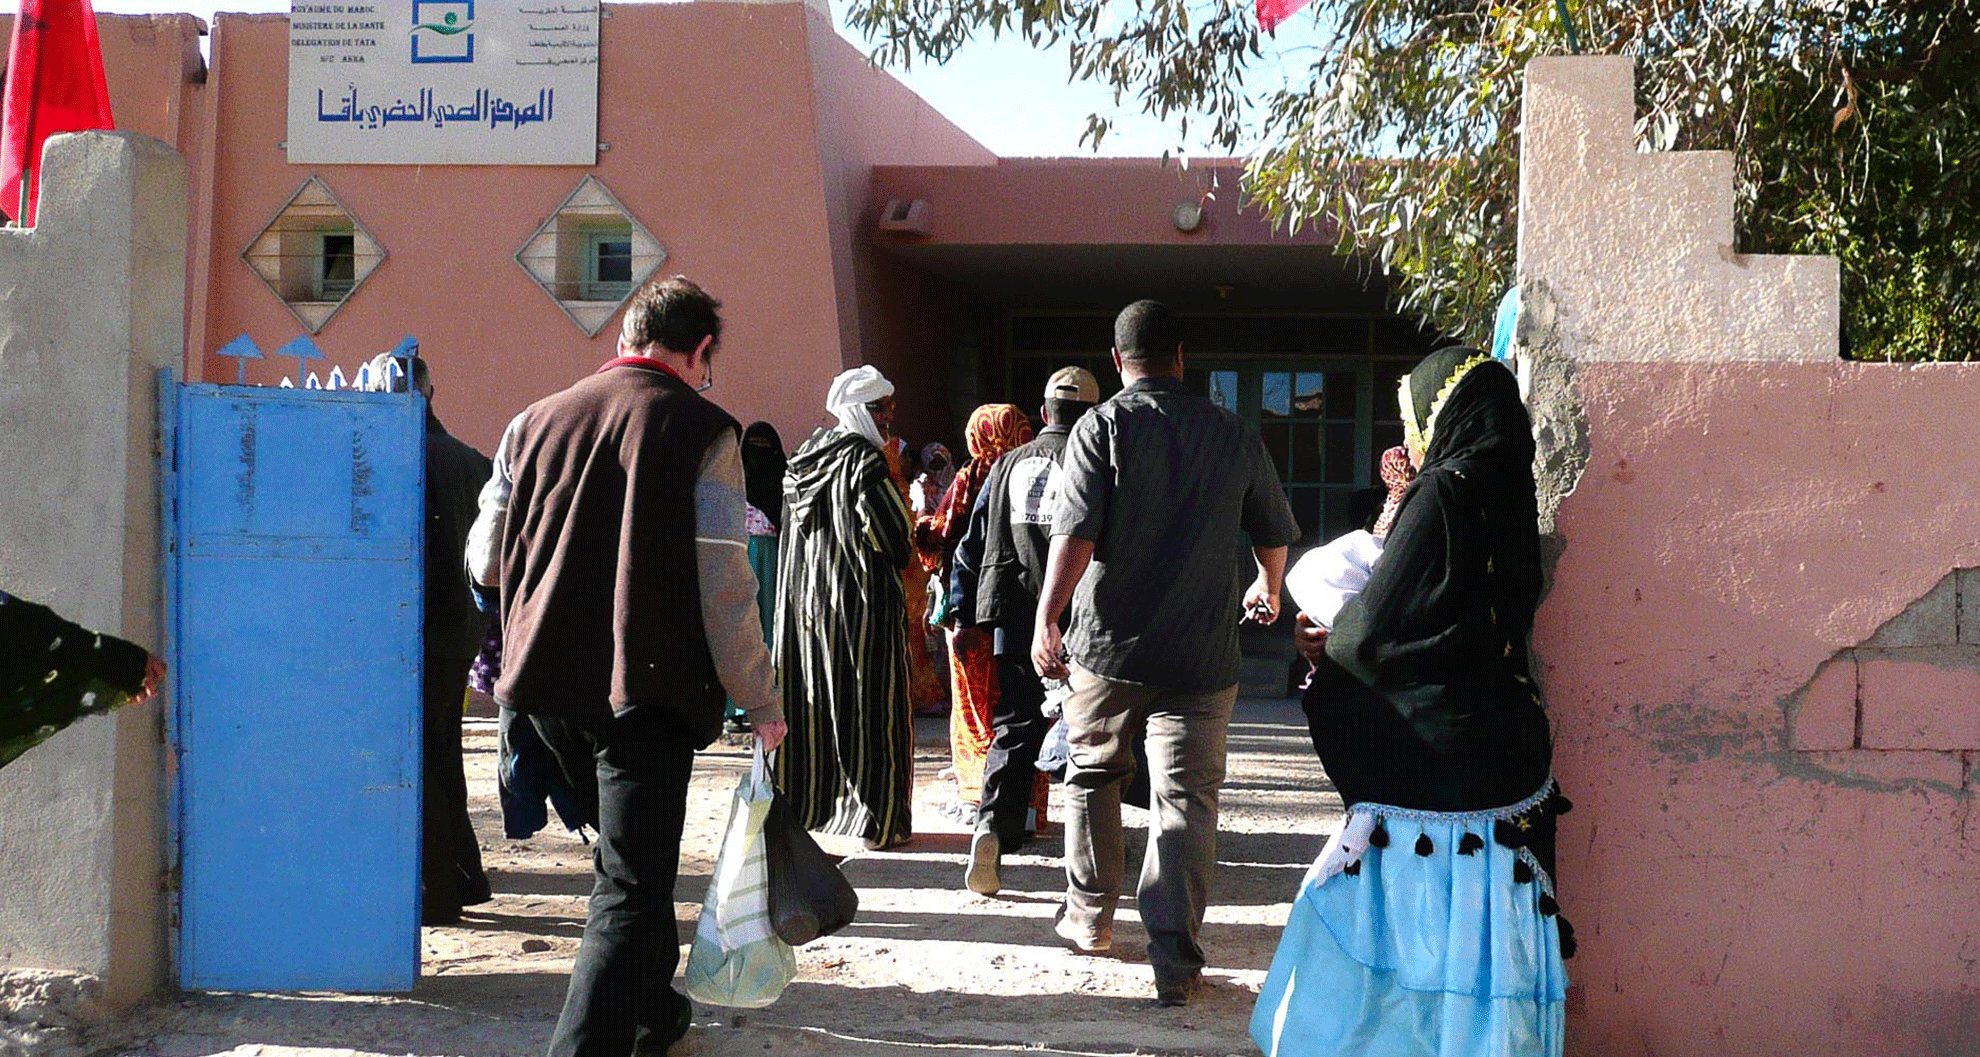 province de tata - sud du Maroc ©medic'art - KMS communication #lesaudacieux